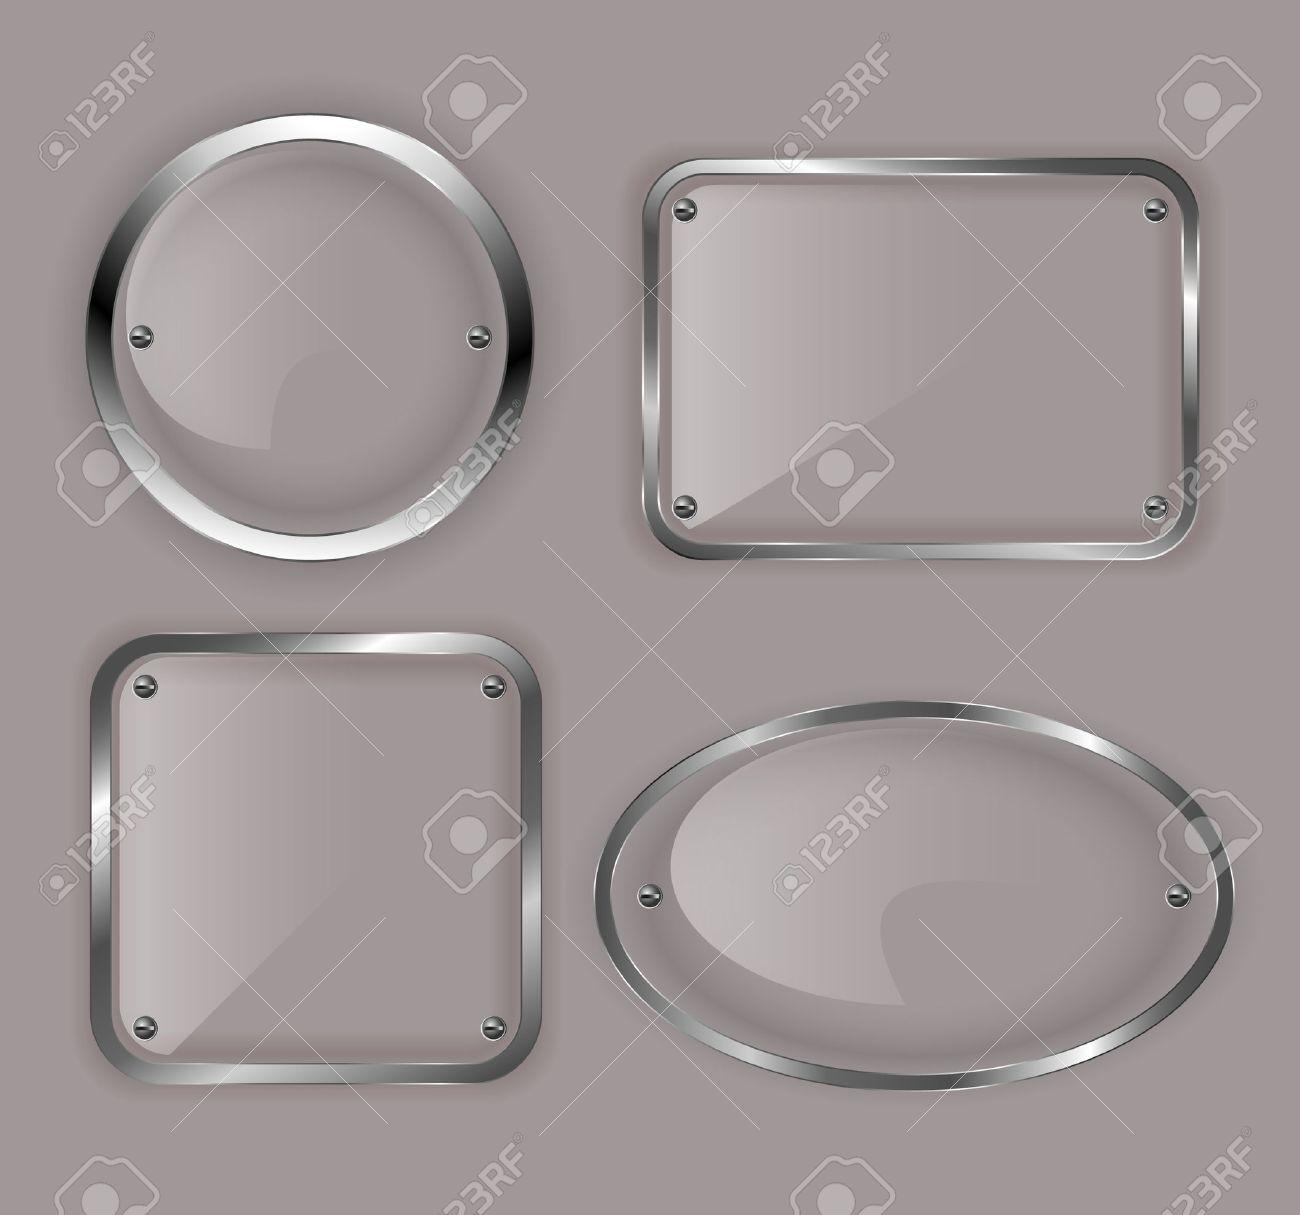 Set of glass plates in metal frames illustration Stock Vector - 14620405